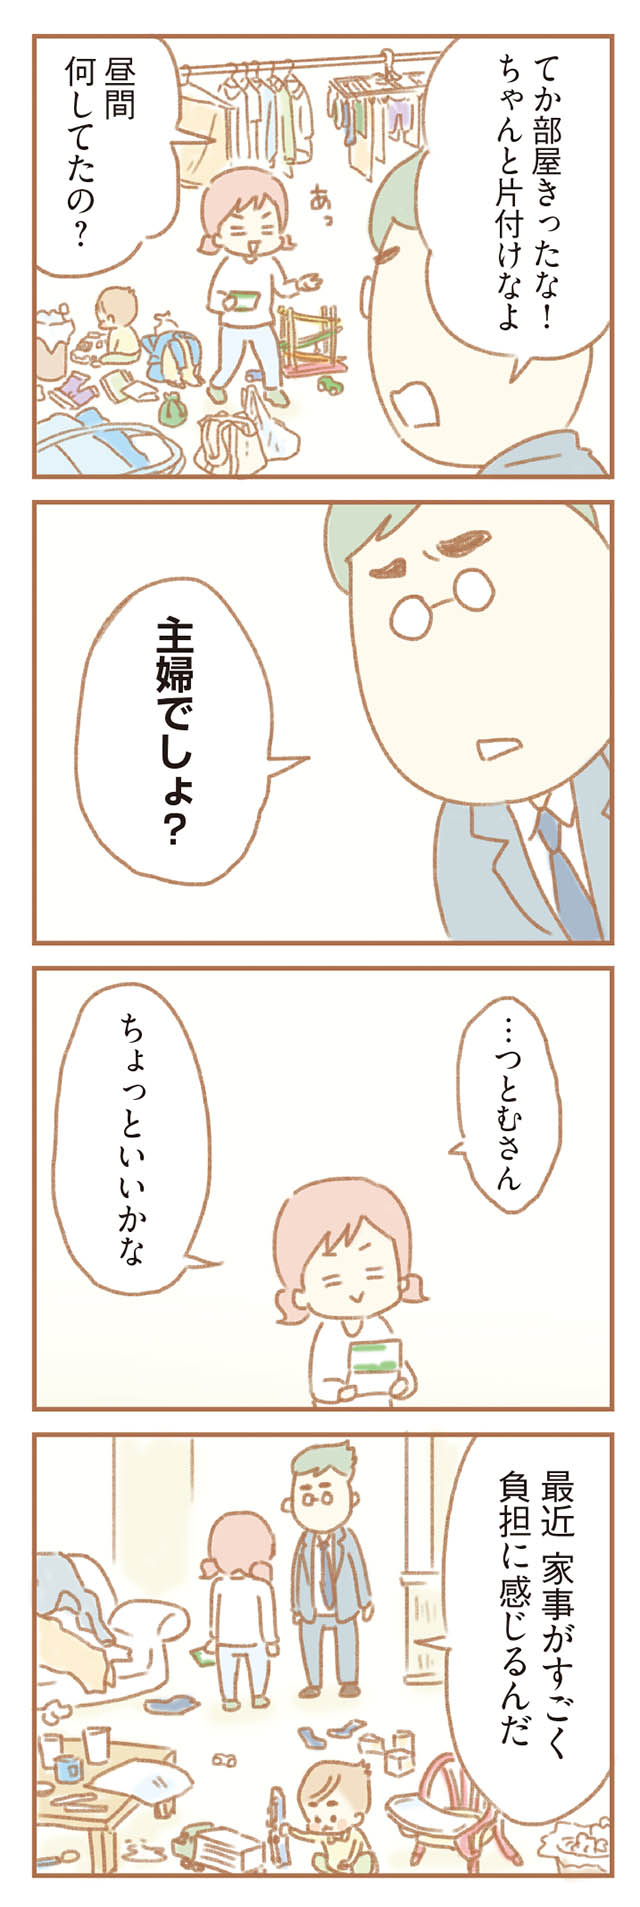 ottonohuyou_p11-1.jpg